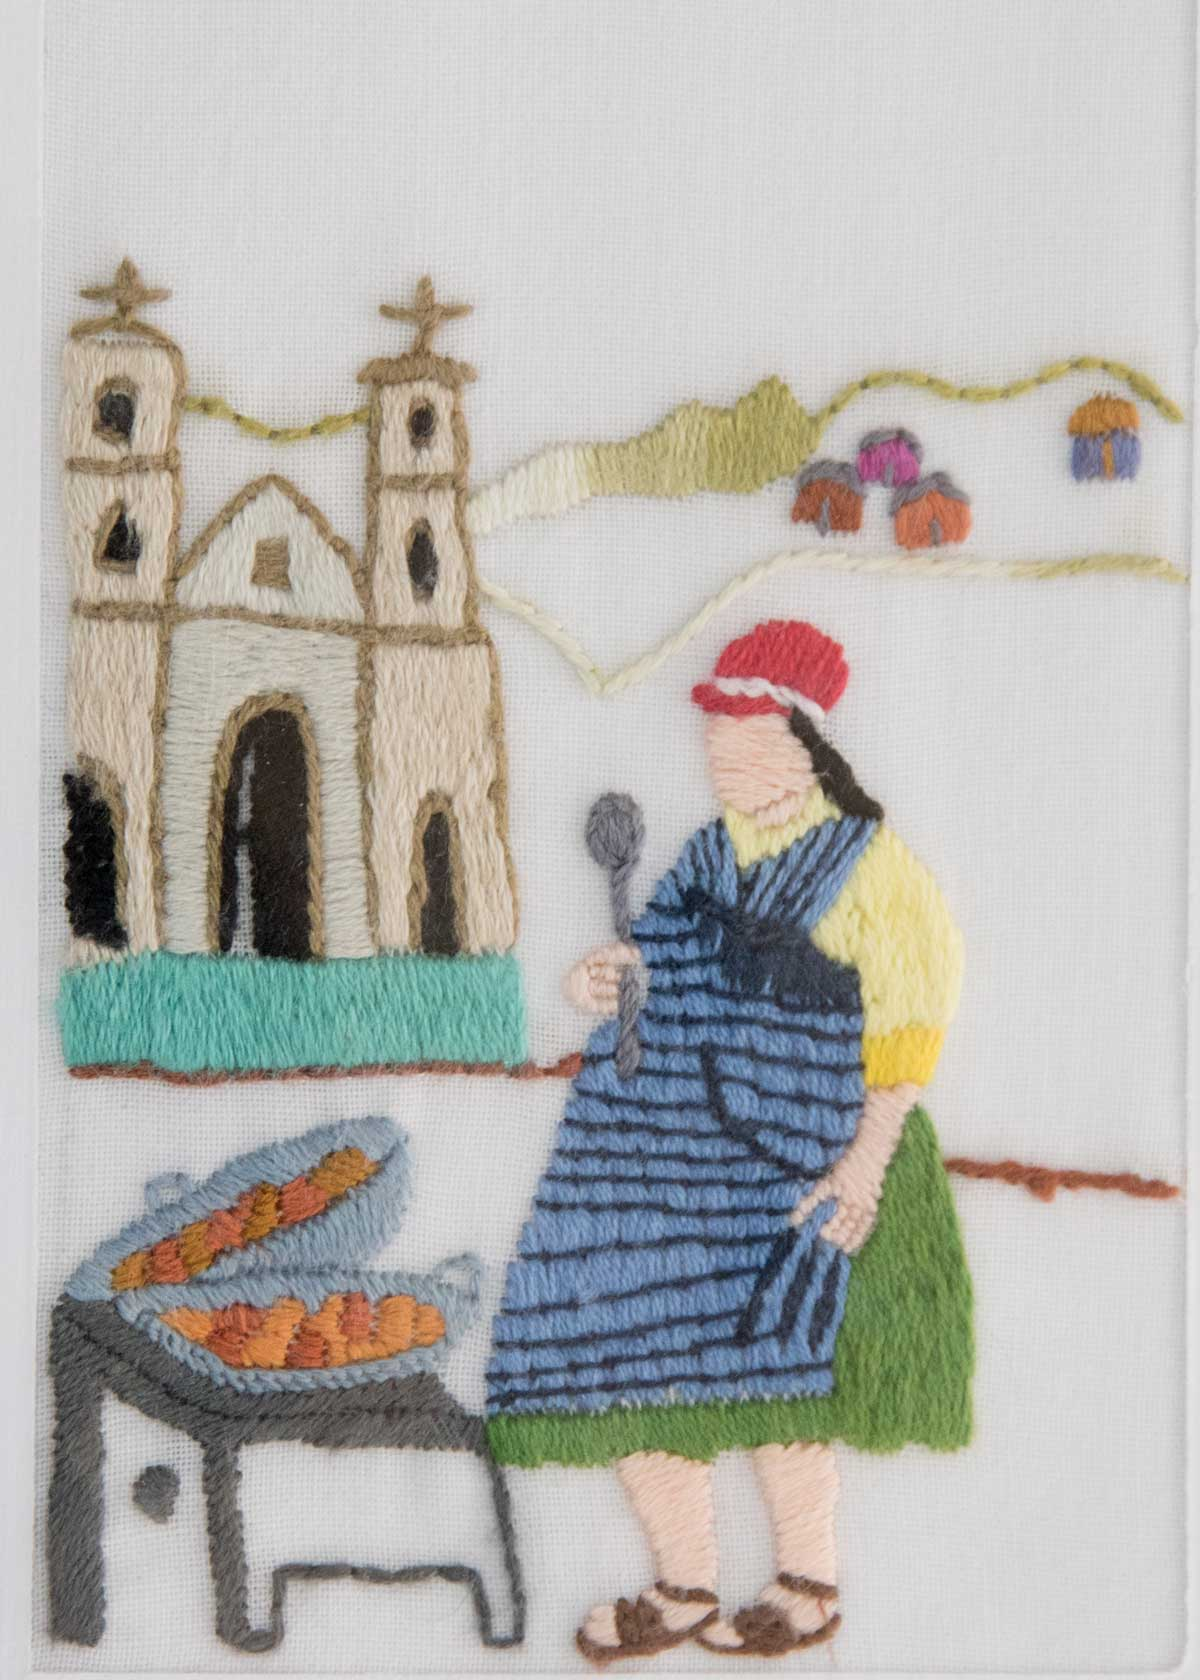 Cuenca Vendor; Exhibit of Cuenca Fiber Artists | ©Angela Drake